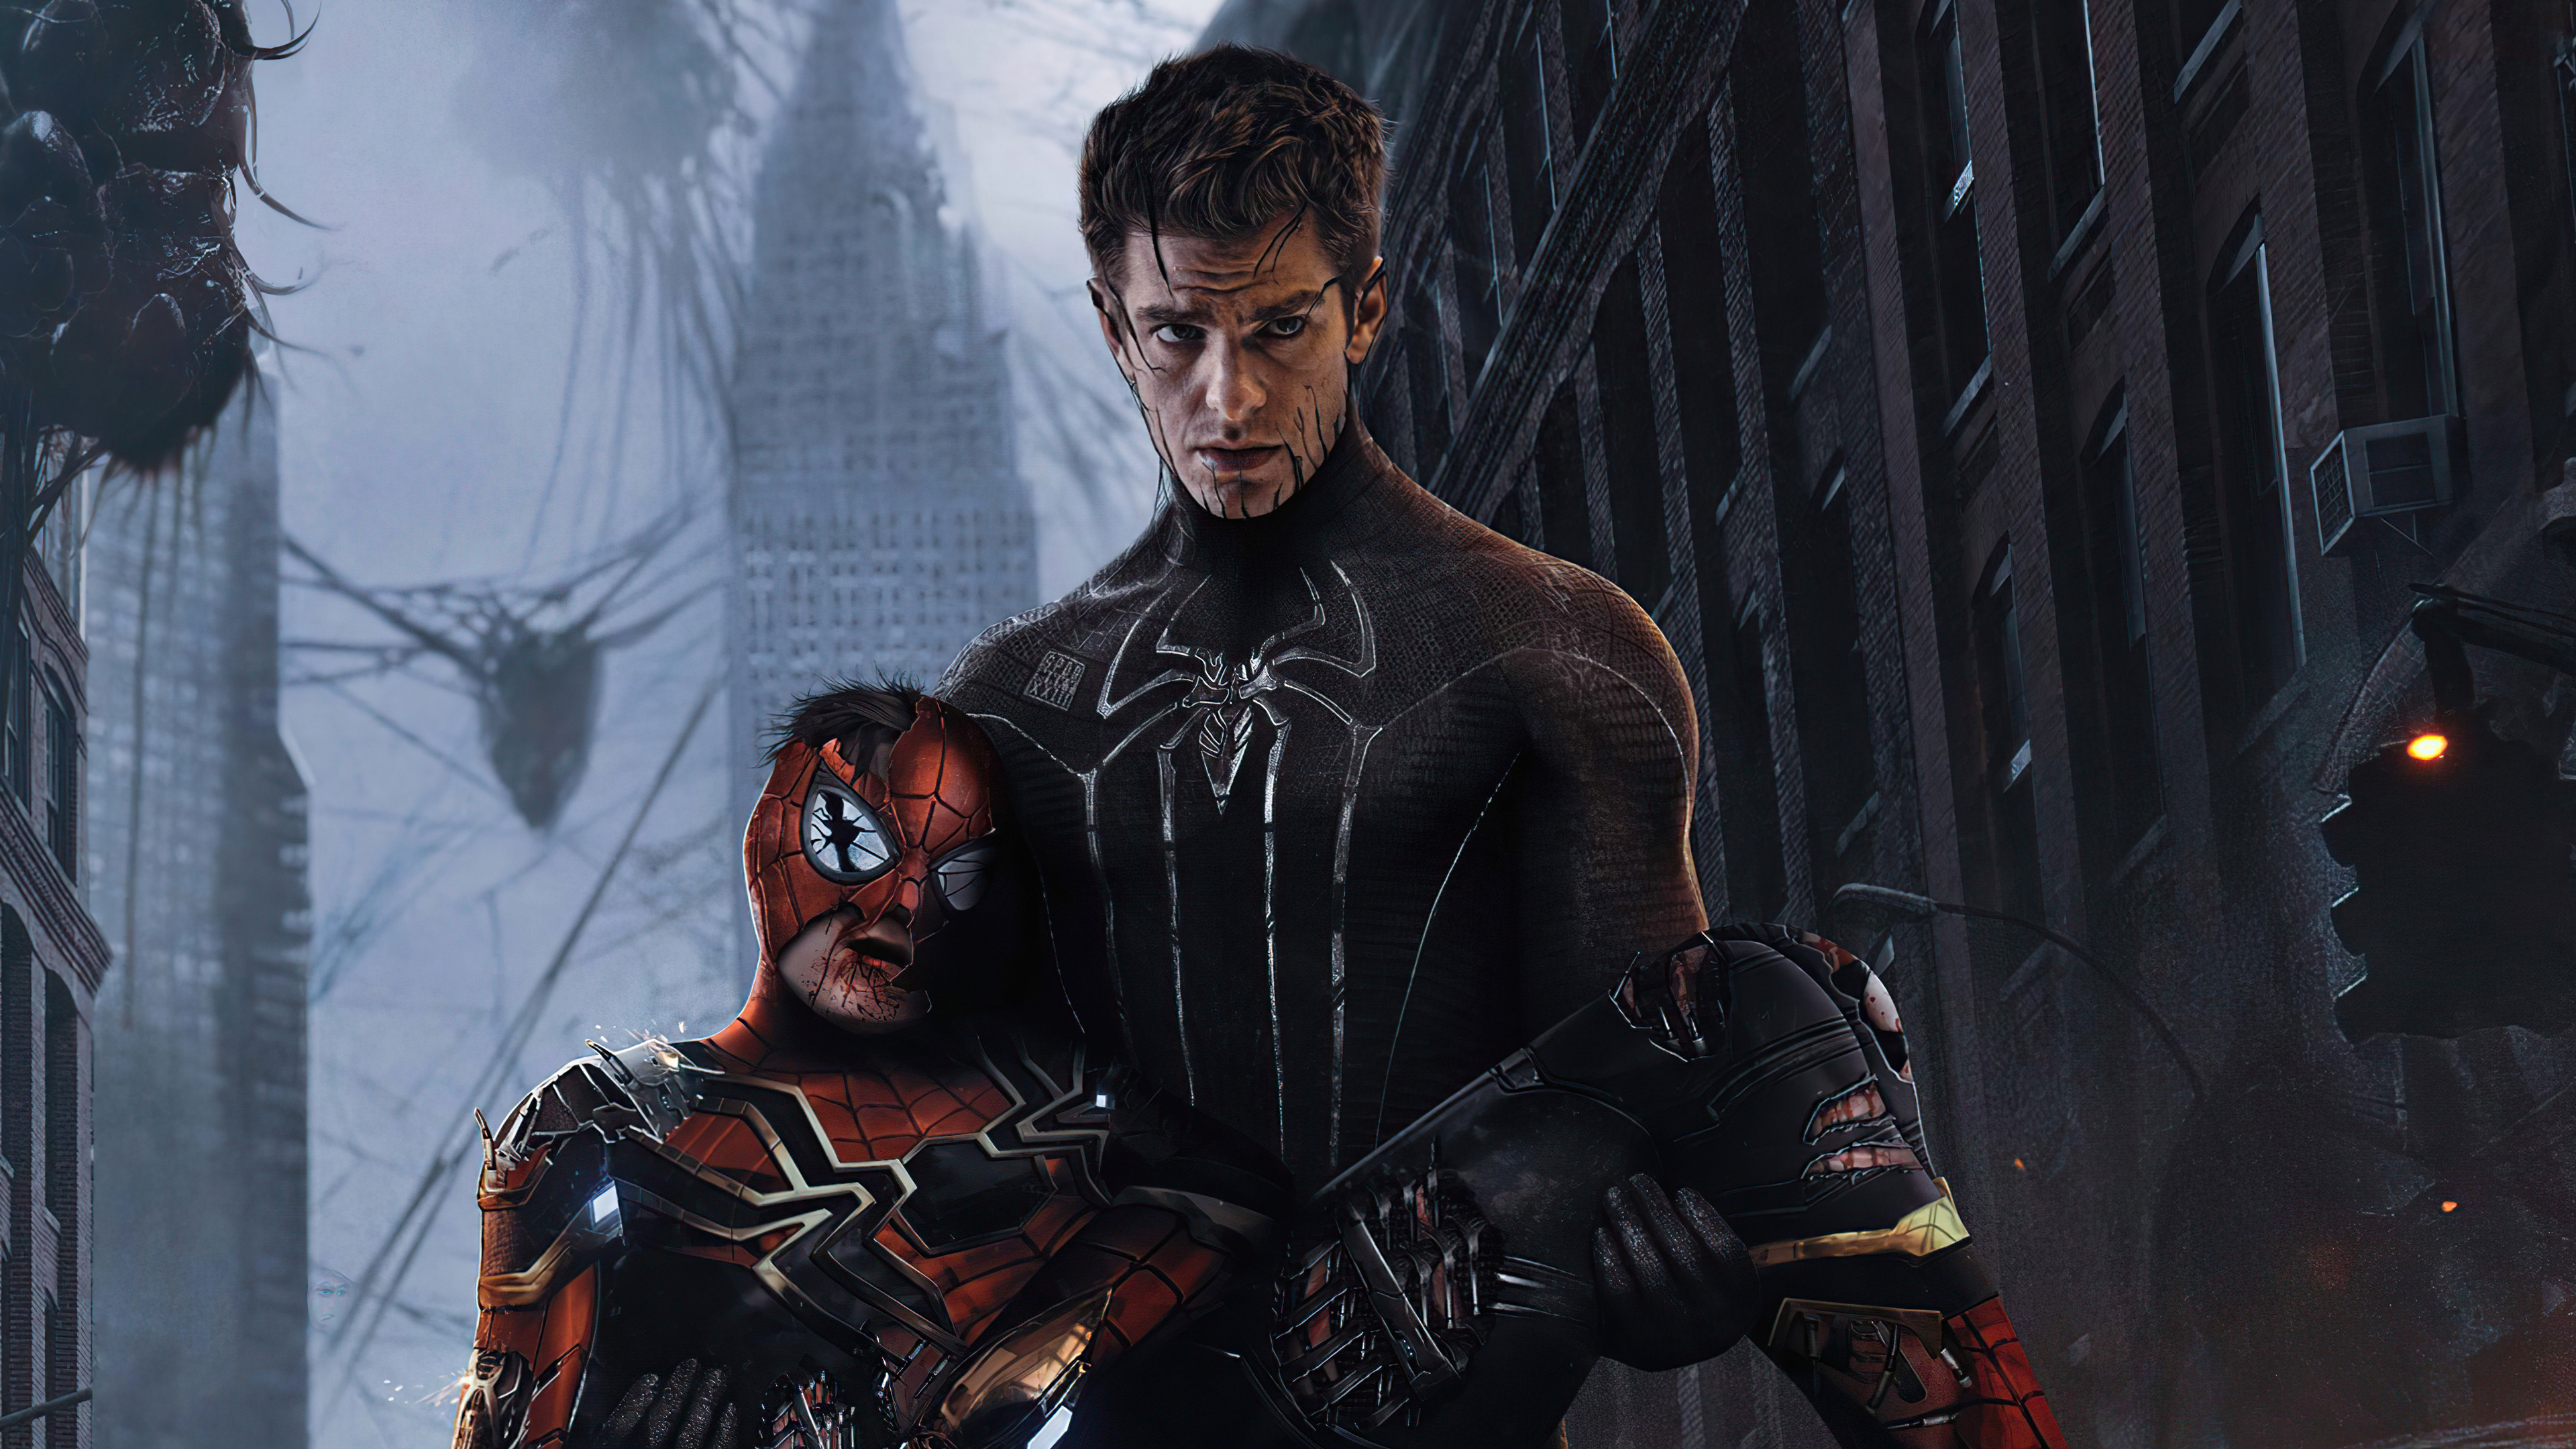 spiderman in multiverse 4k 1616956633 - Spiderman In Multiverse 4k - Spiderman In Multiverse 4k wallpapers